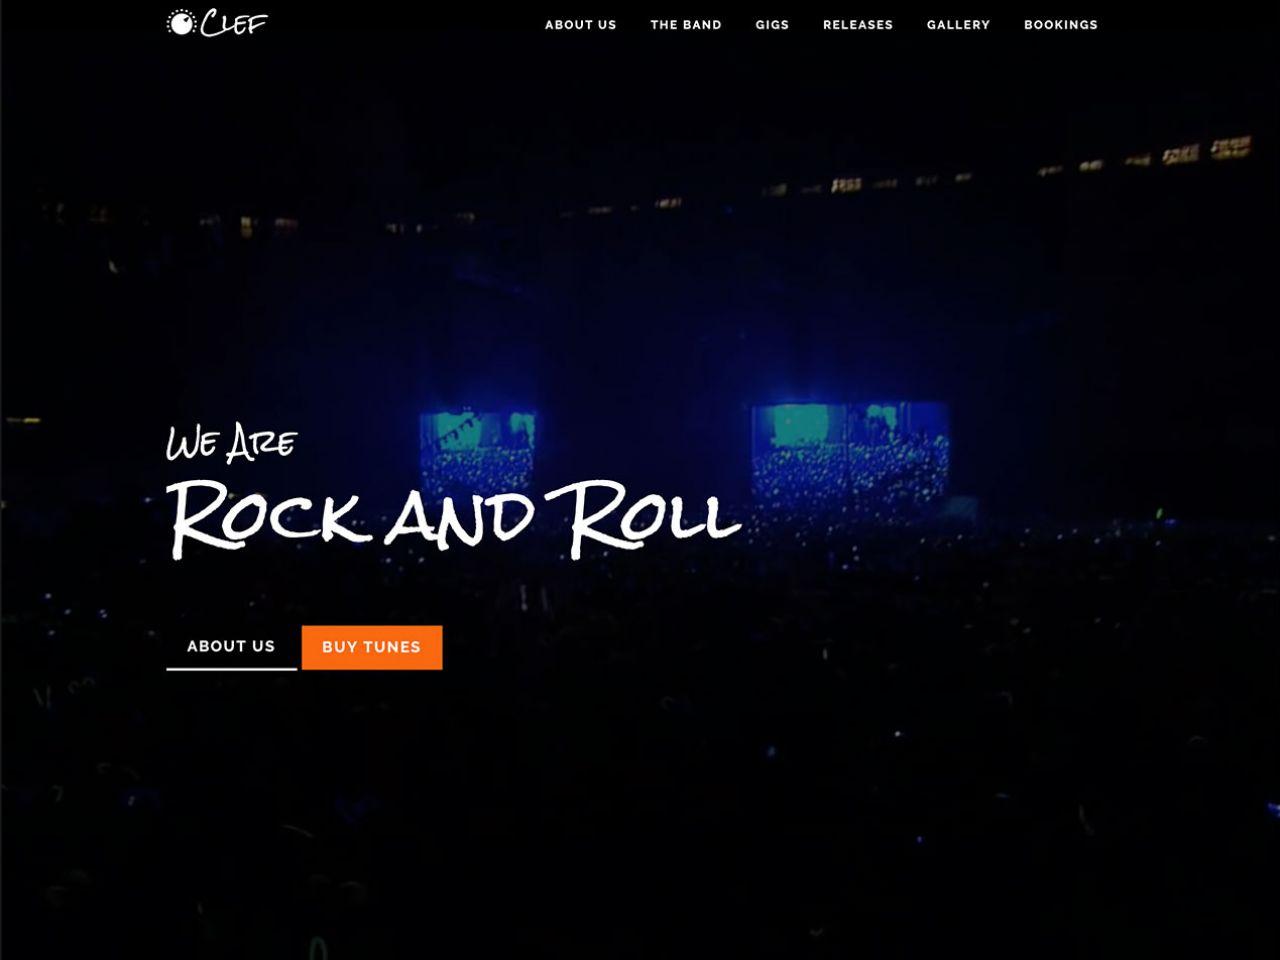 Clef-音乐网站模板